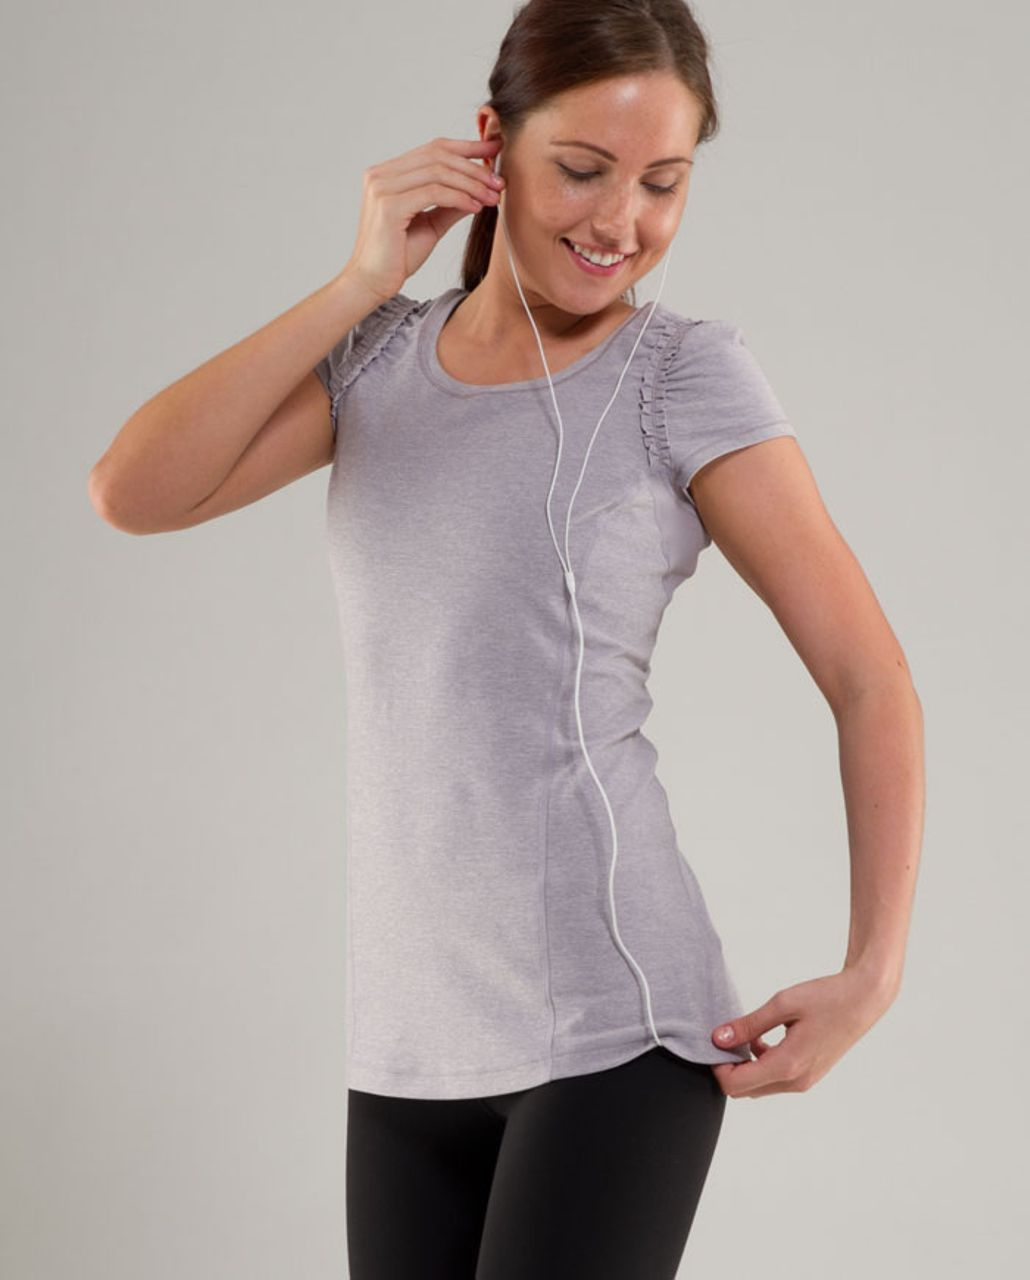 Lululemon Run:  Full Tilt Short Sleeve - Heathered Lavender Grey /  Lavender Grey